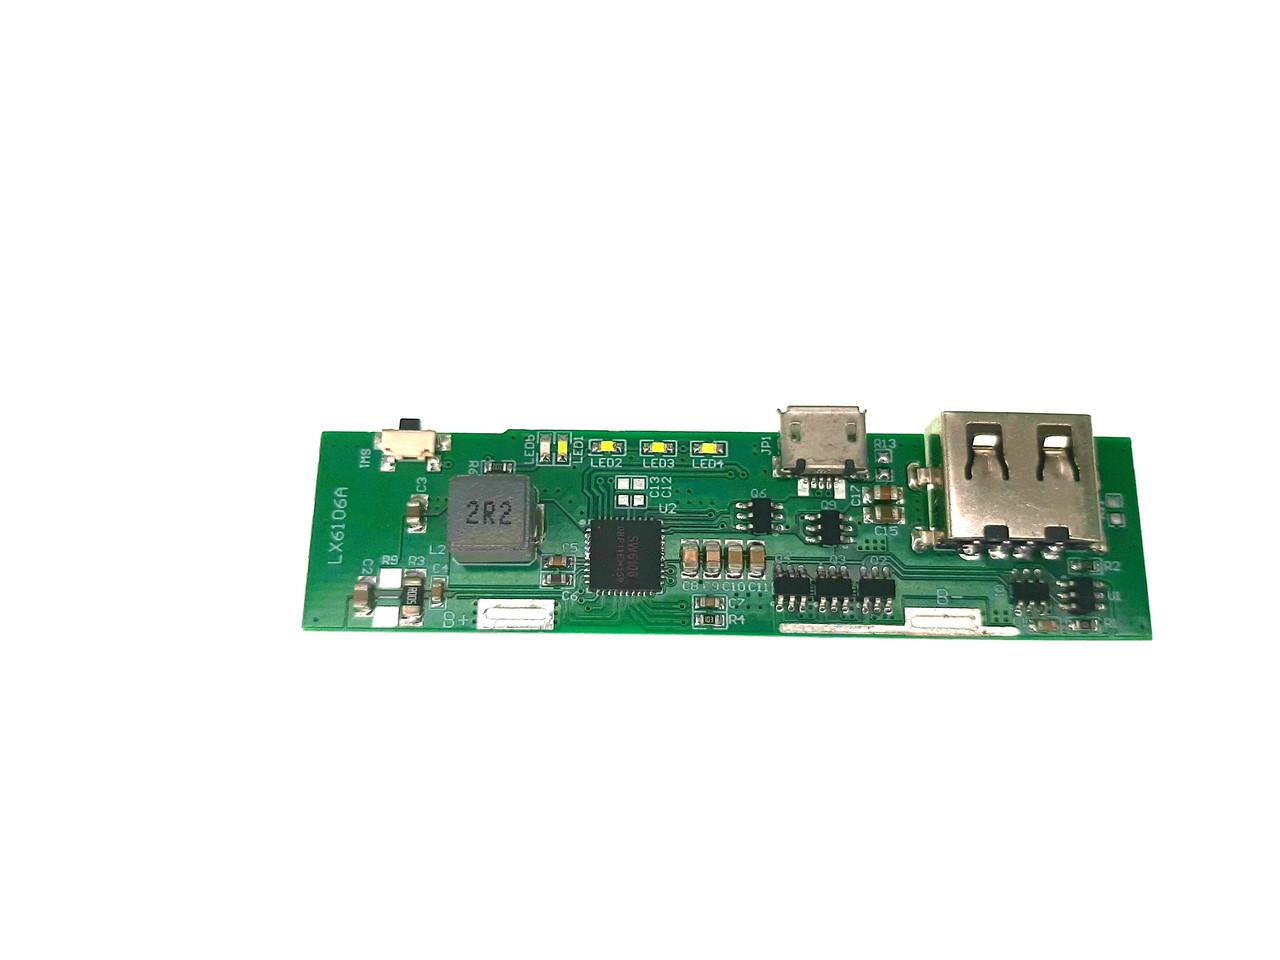 Плата POWER BANK QC3.0 Быстрая зарядка 5V9V12V 3A MICRO-USB к Power Bank Xiaomi 10400mah или 2080mah